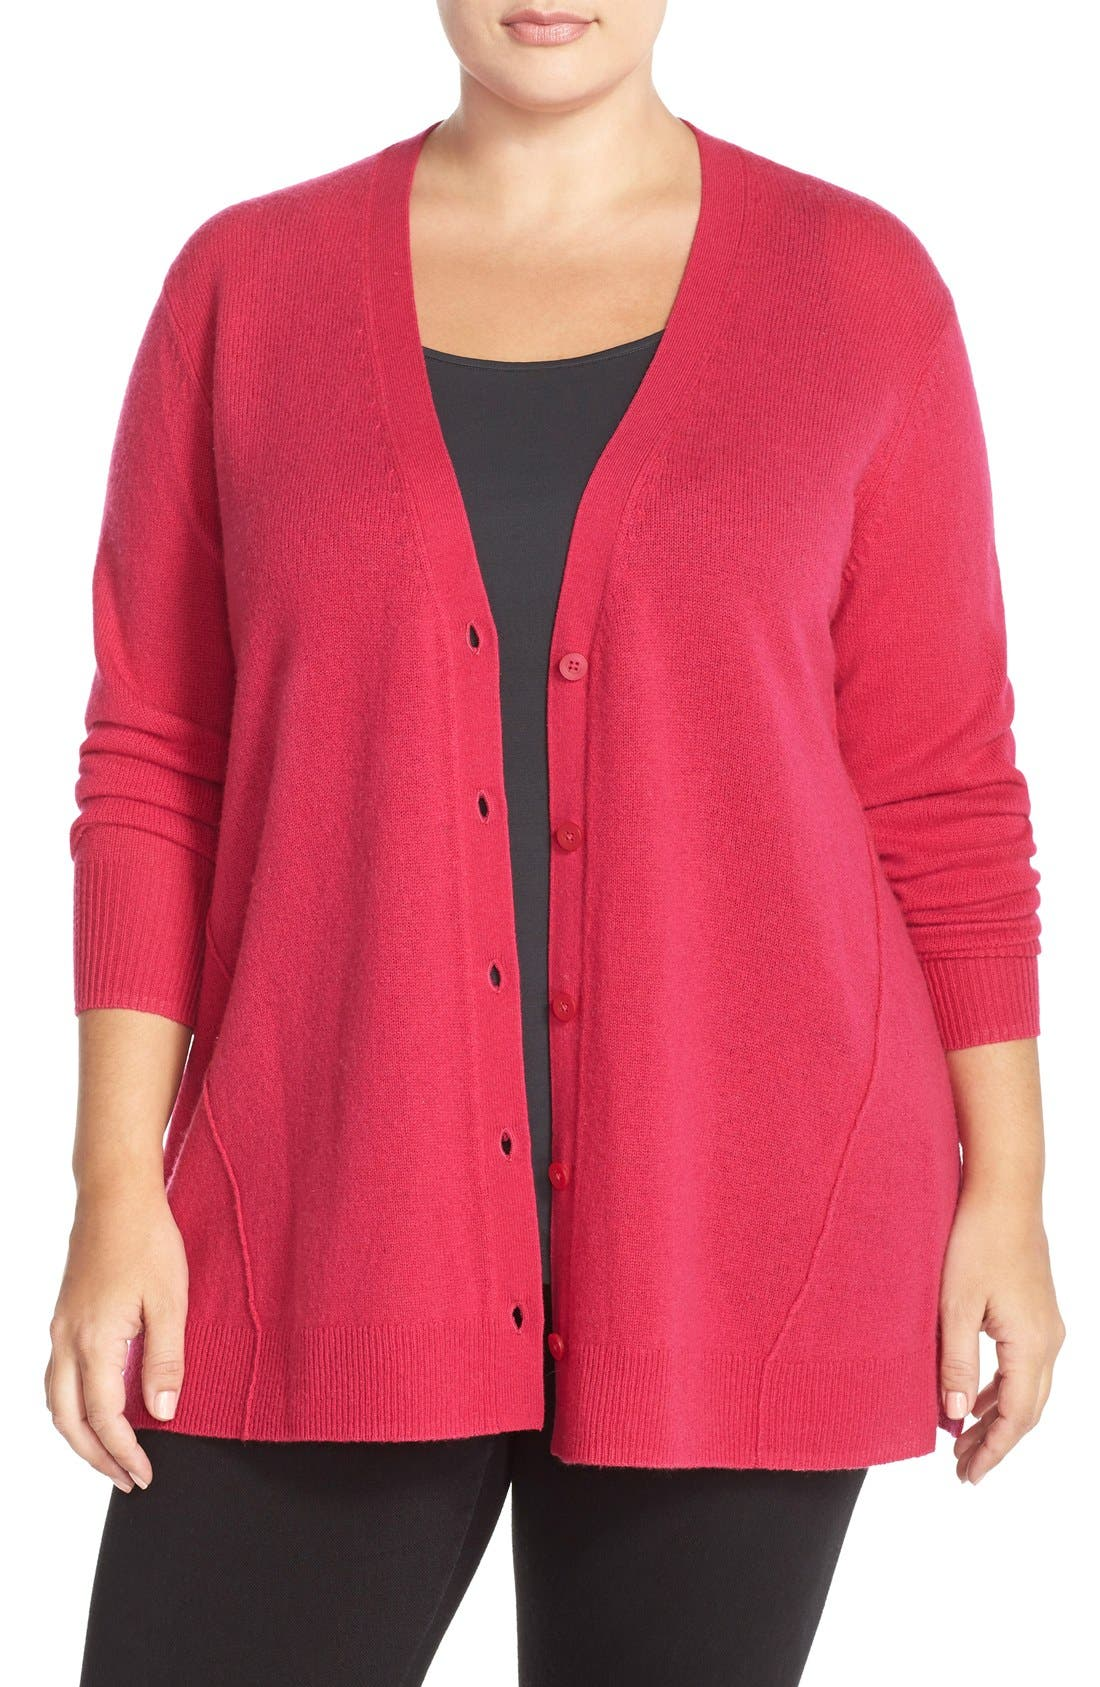 Alternate Image 1 Selected - Sejour Wool & Cashmere Trapeze Cardigan (Plus Size)